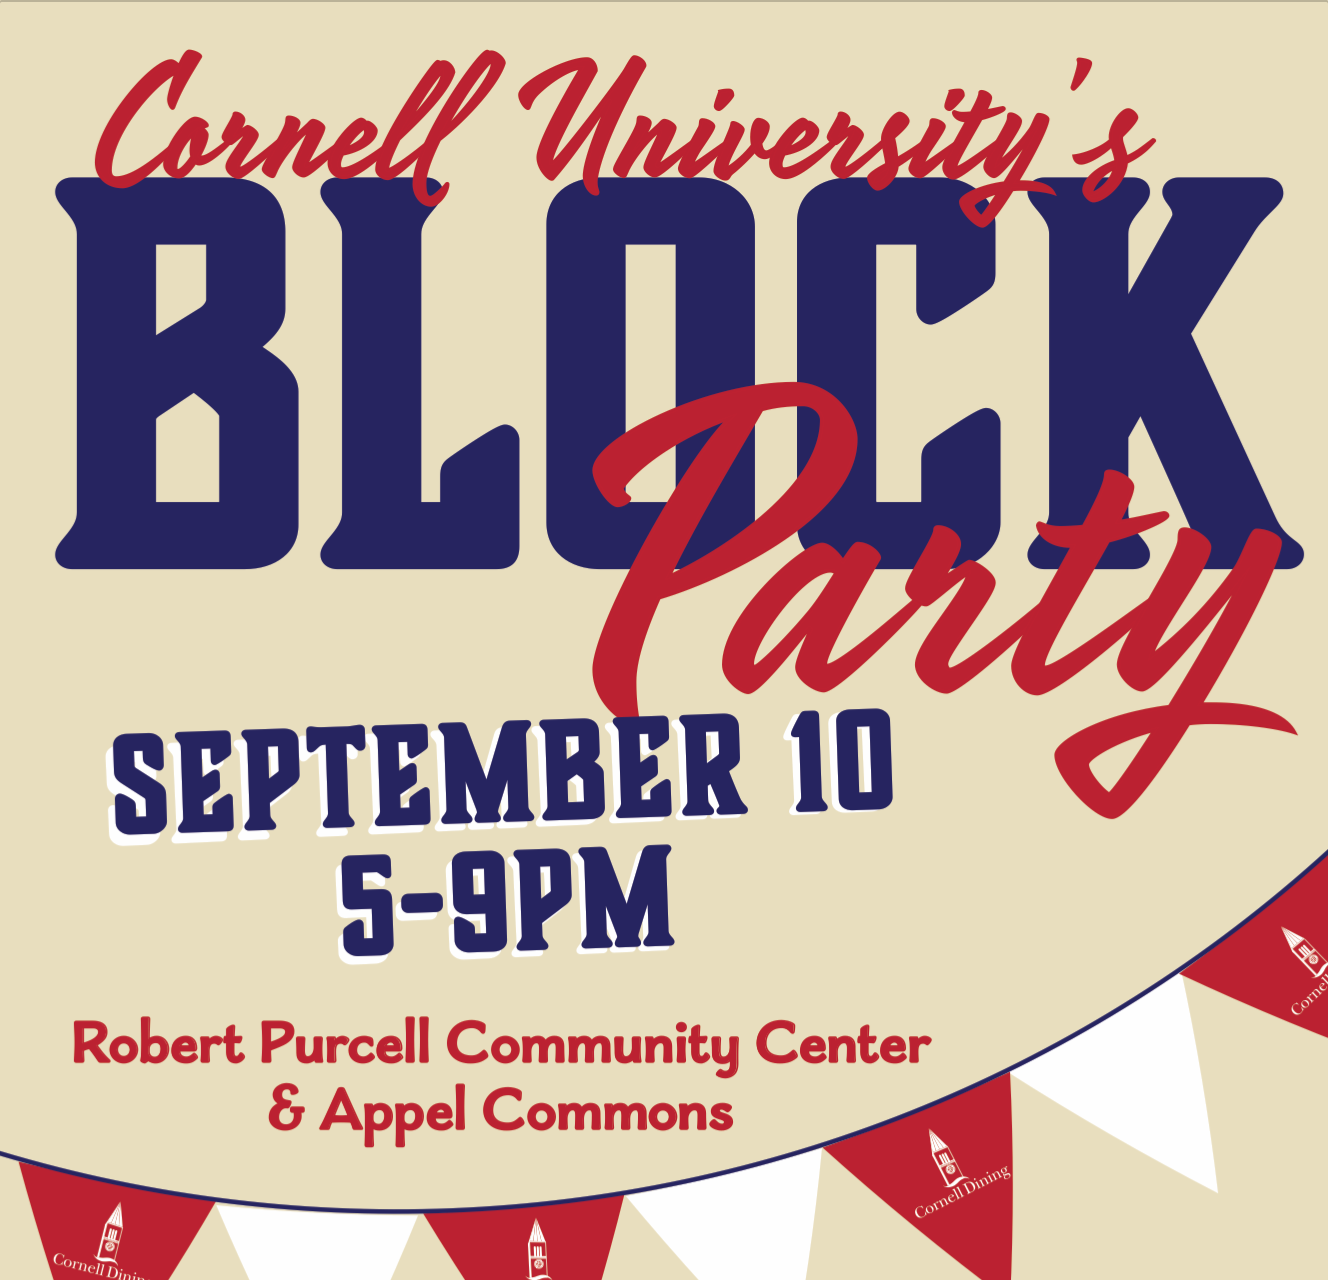 Cornell University's Block Party